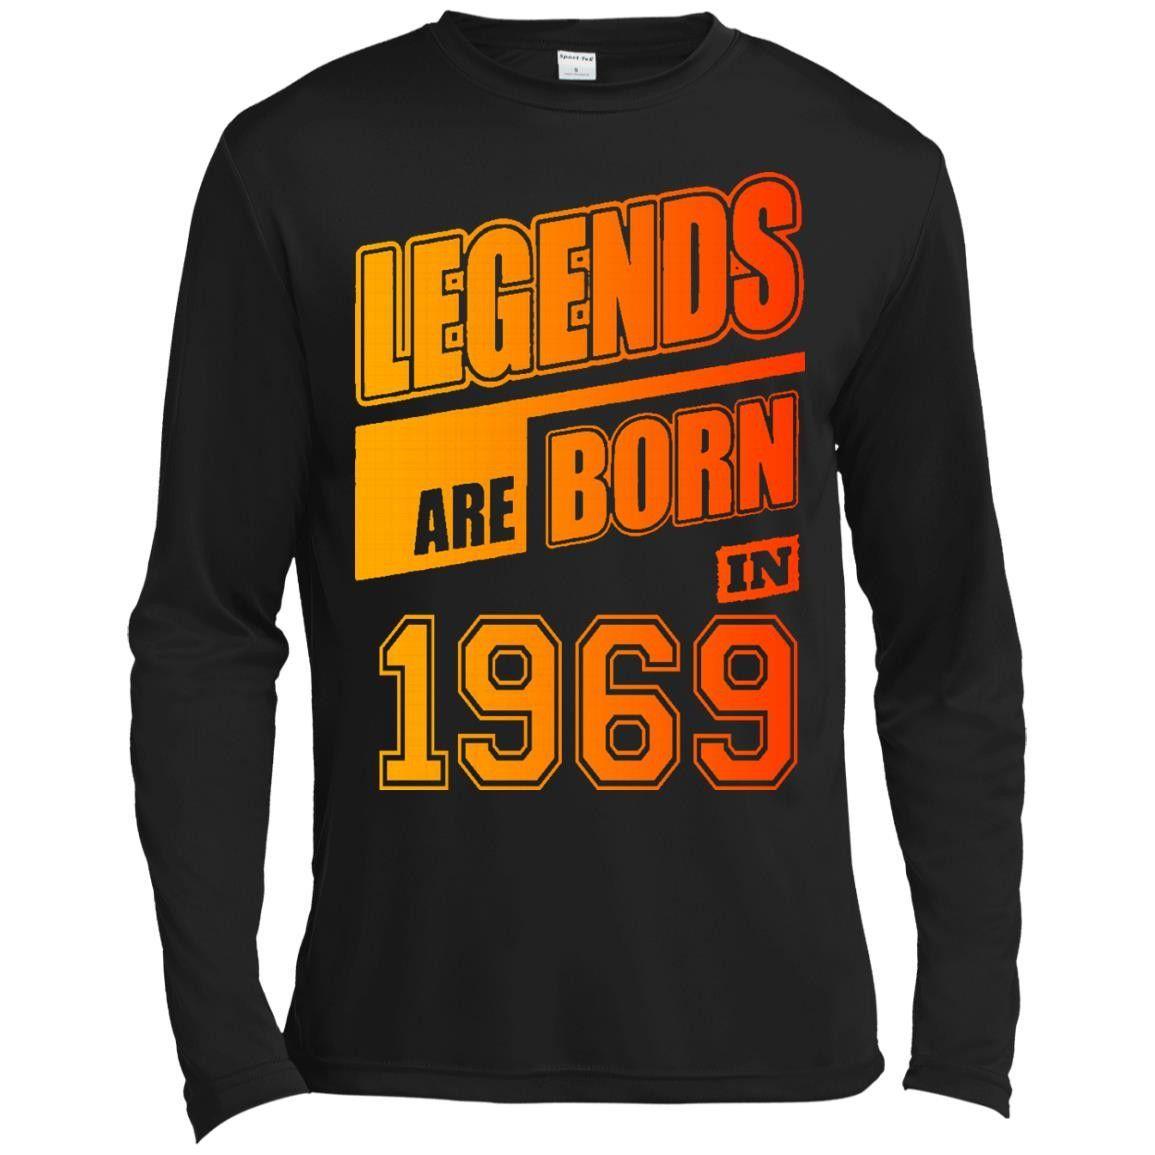 LEGENDS ARE BORN IN 1969 14 ST350LS Spor-Tek LS Moisture Absorbing T-Shirt